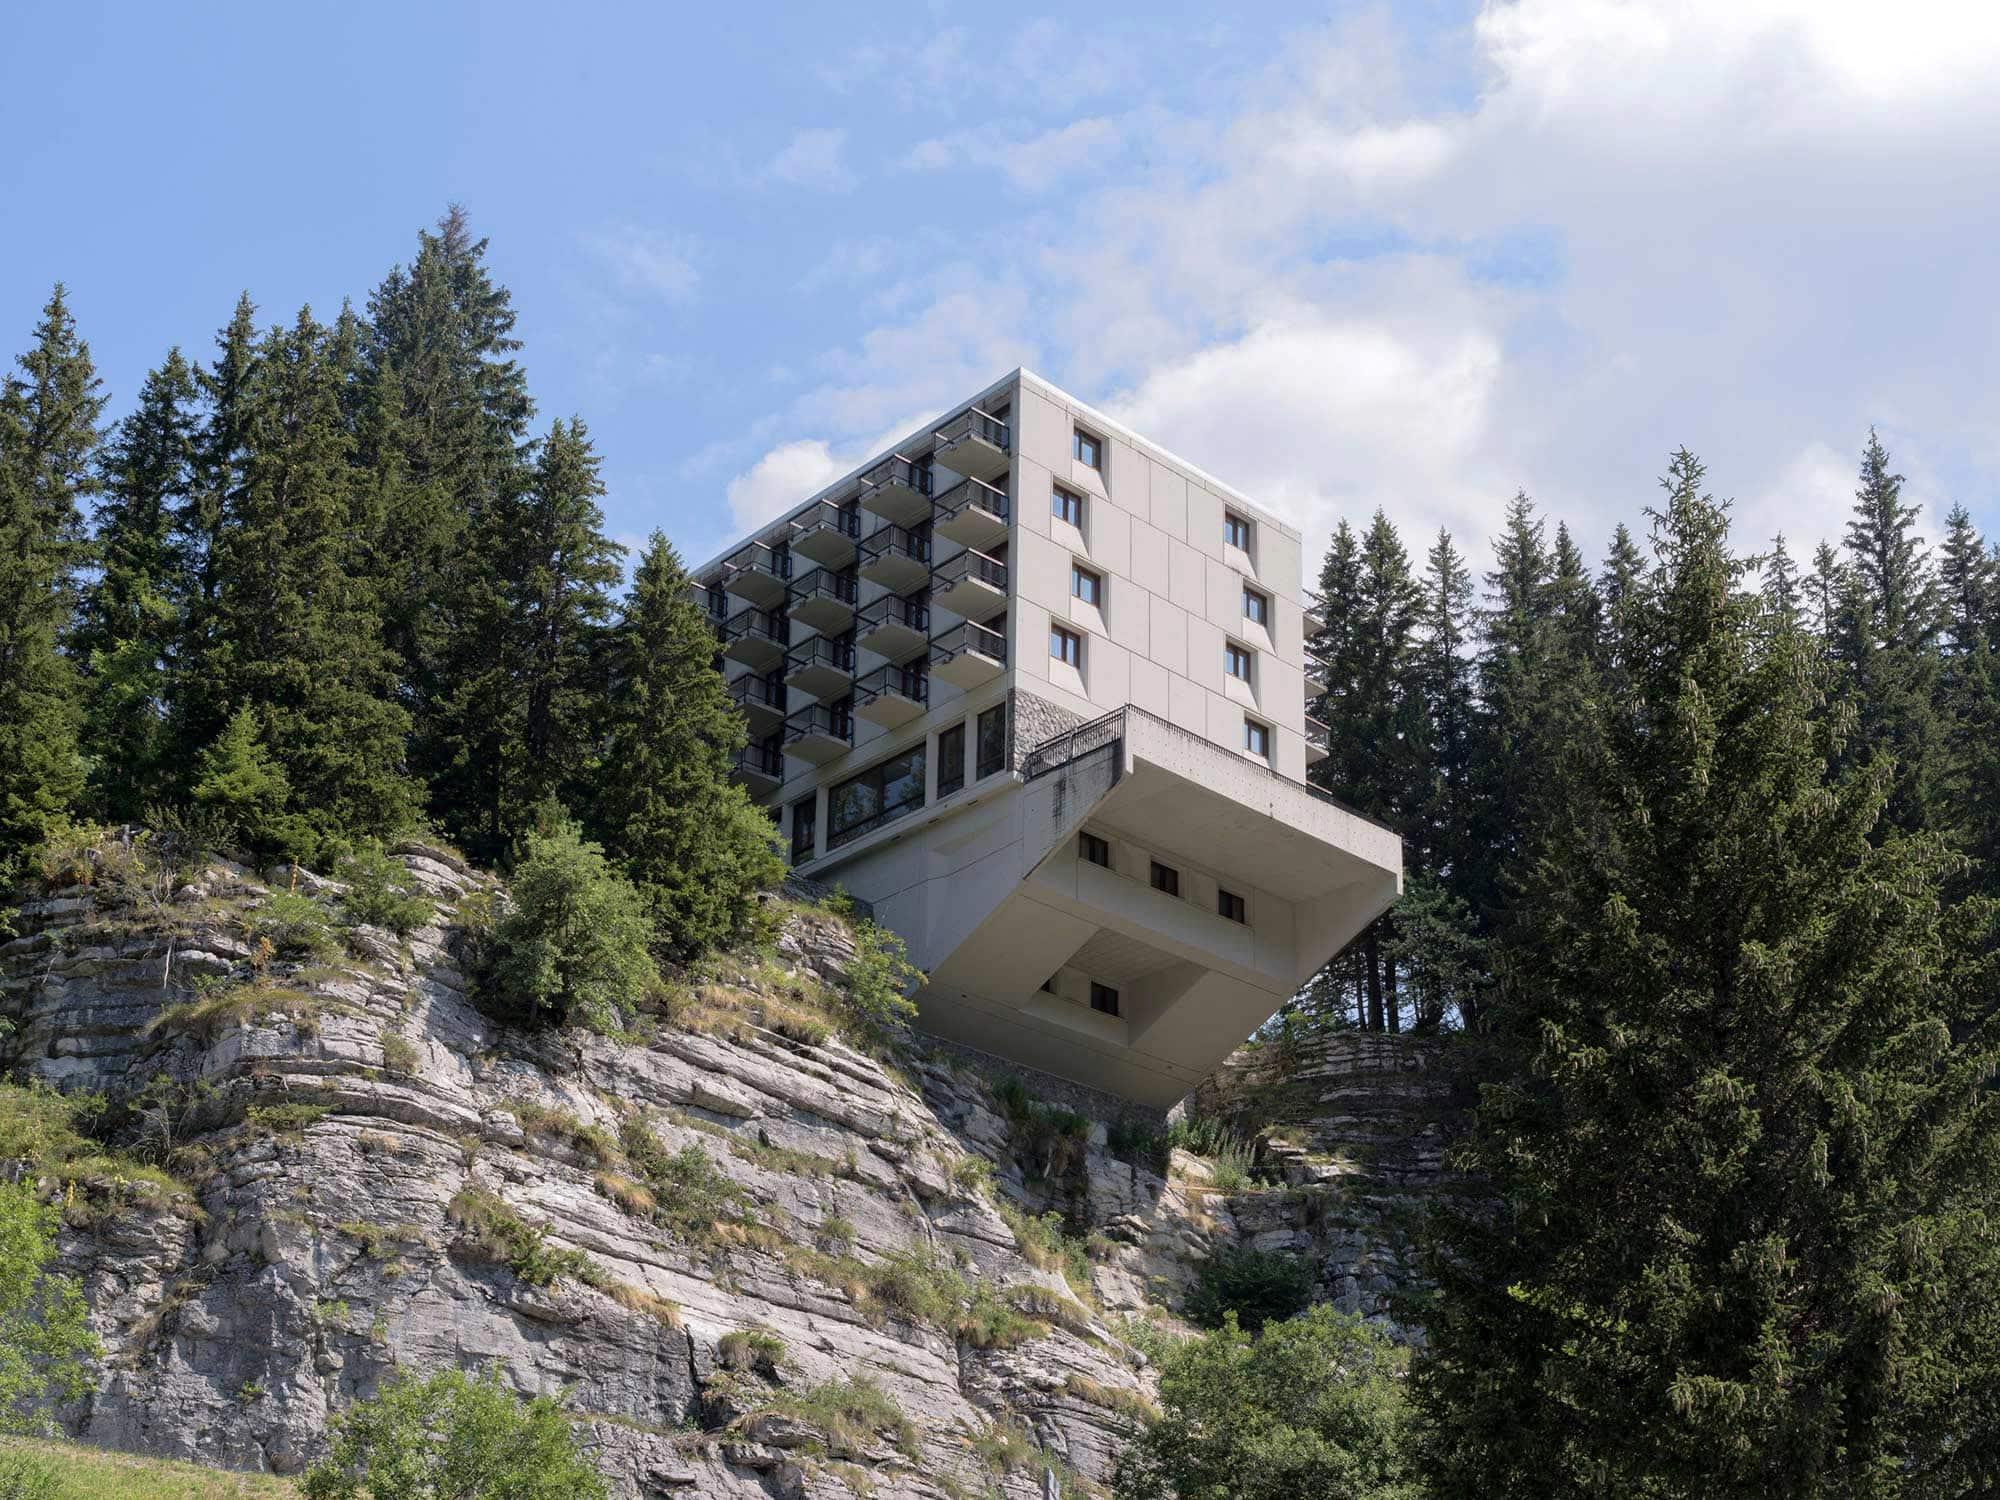 extrait de la revue d'architecture suisse werk, wohnen+bauen